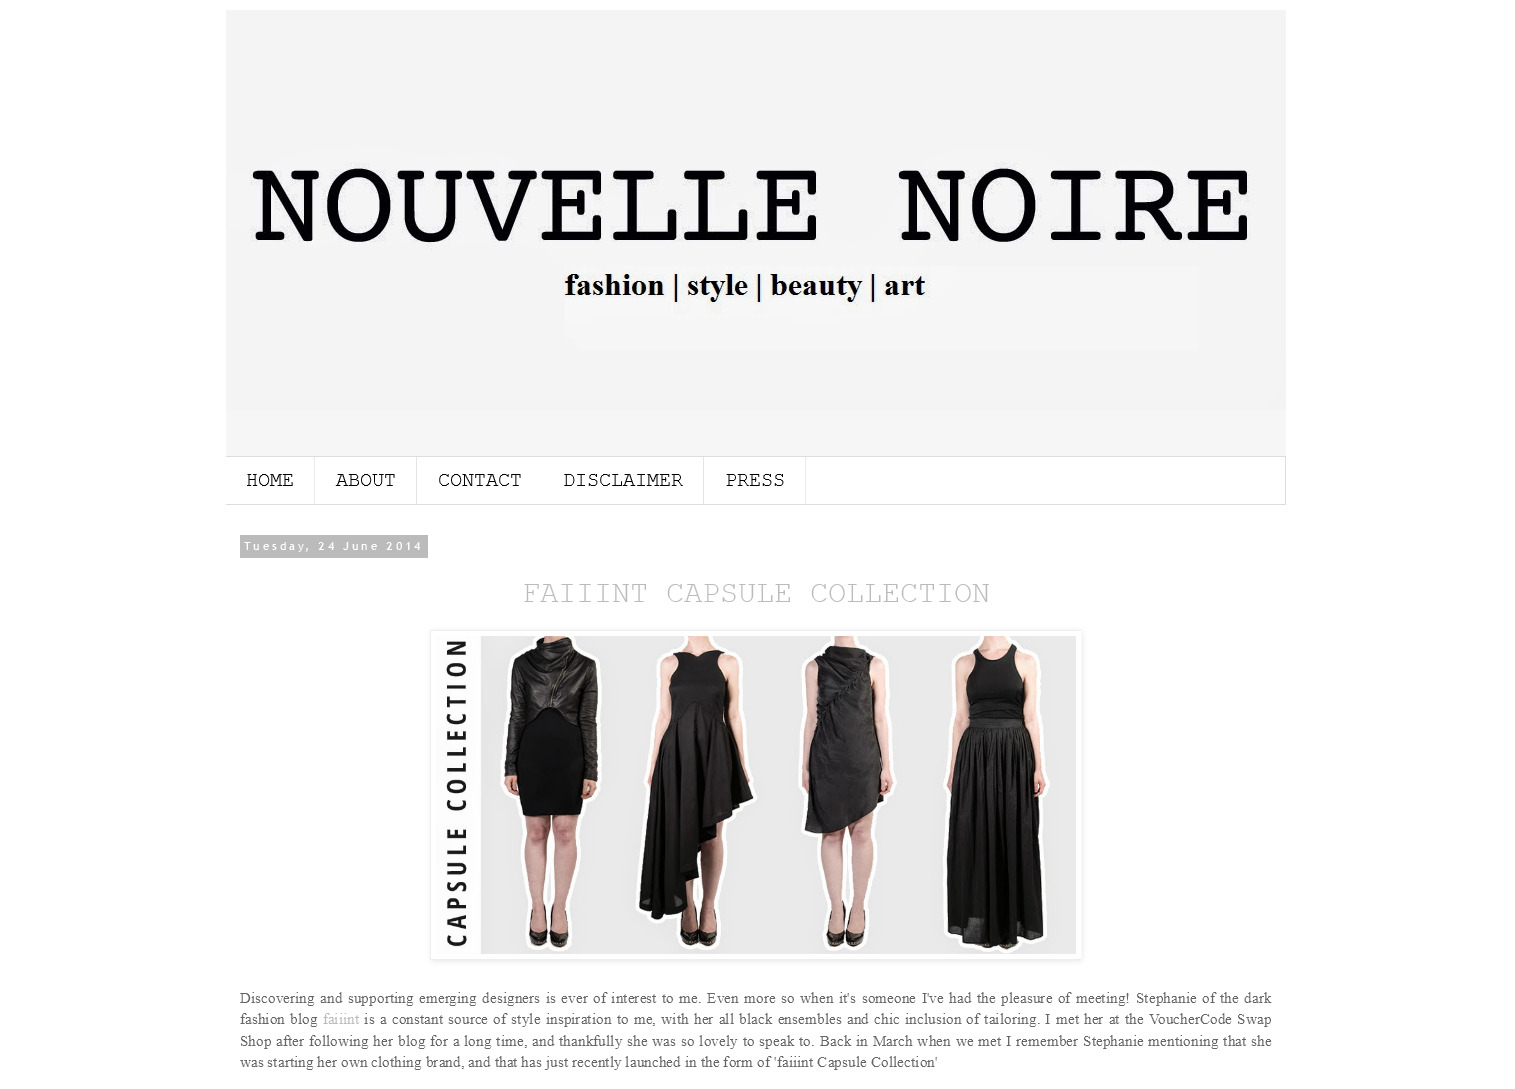 FAIIINT Capsule Collection featured on Nouvelle Noire